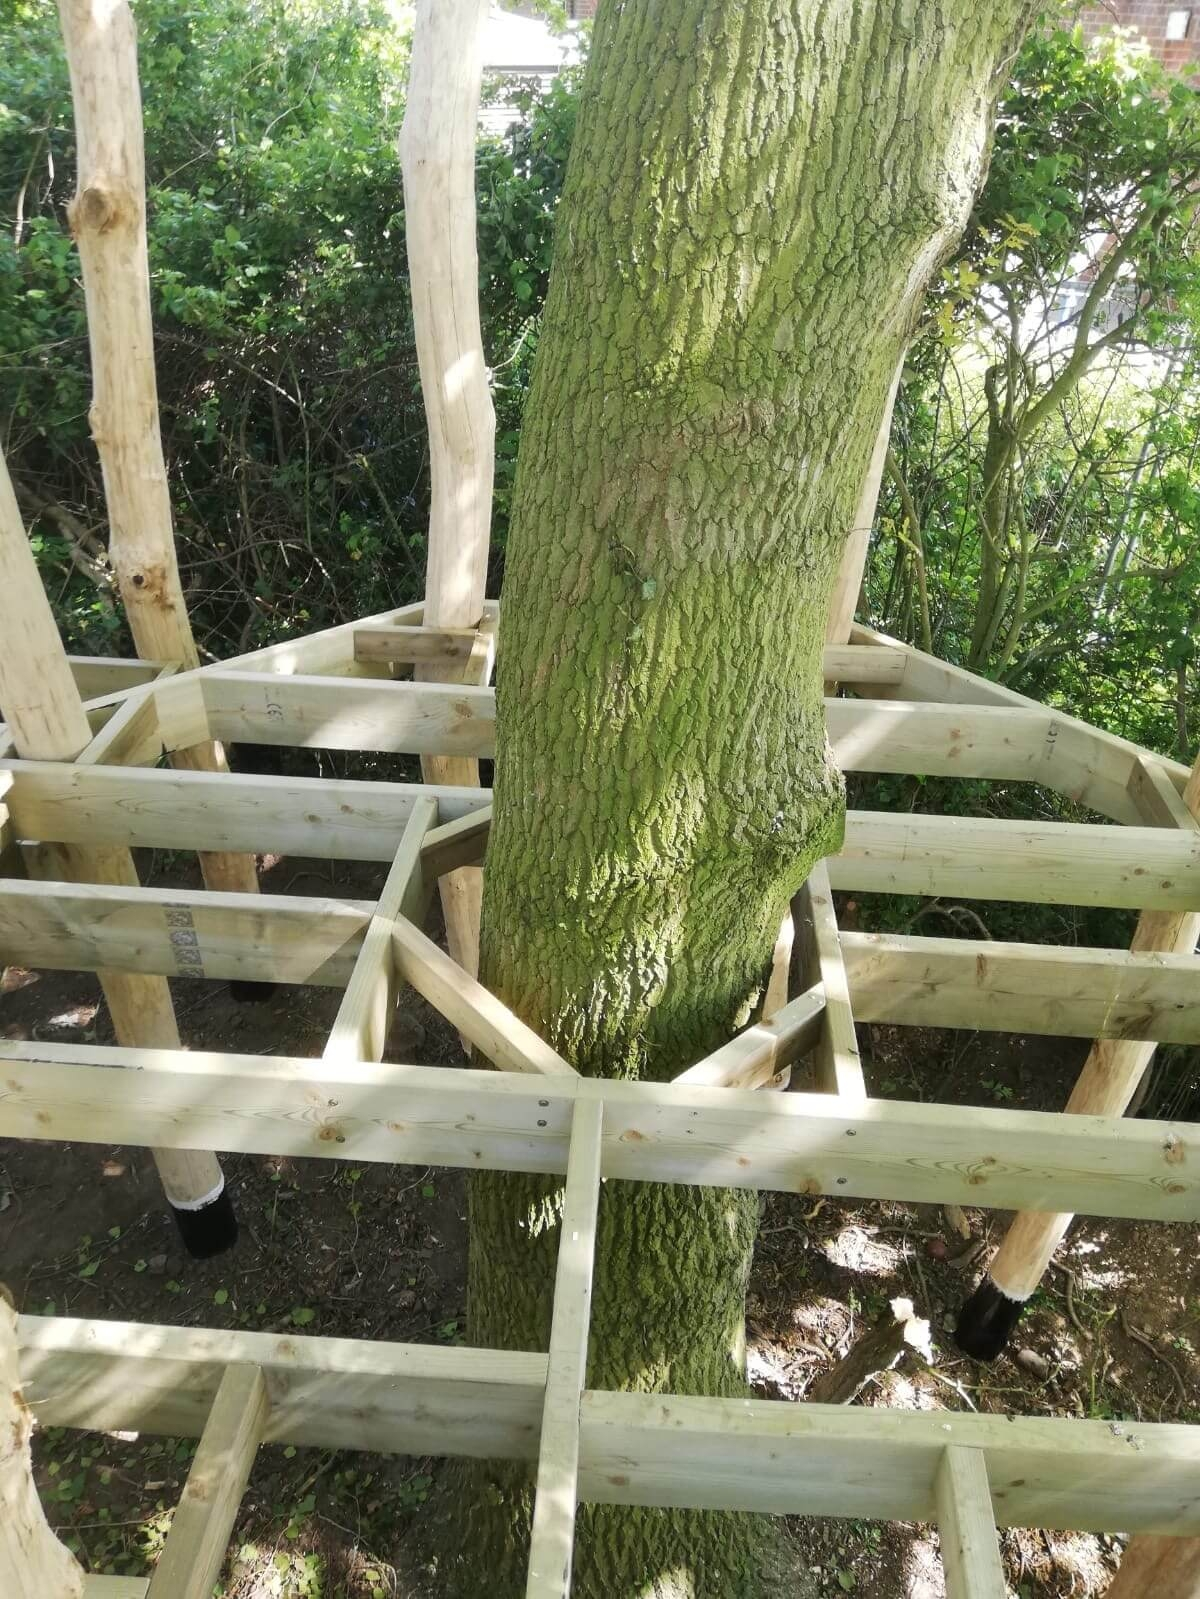 Mundesley School Secret Treehouse adventure play construction 3